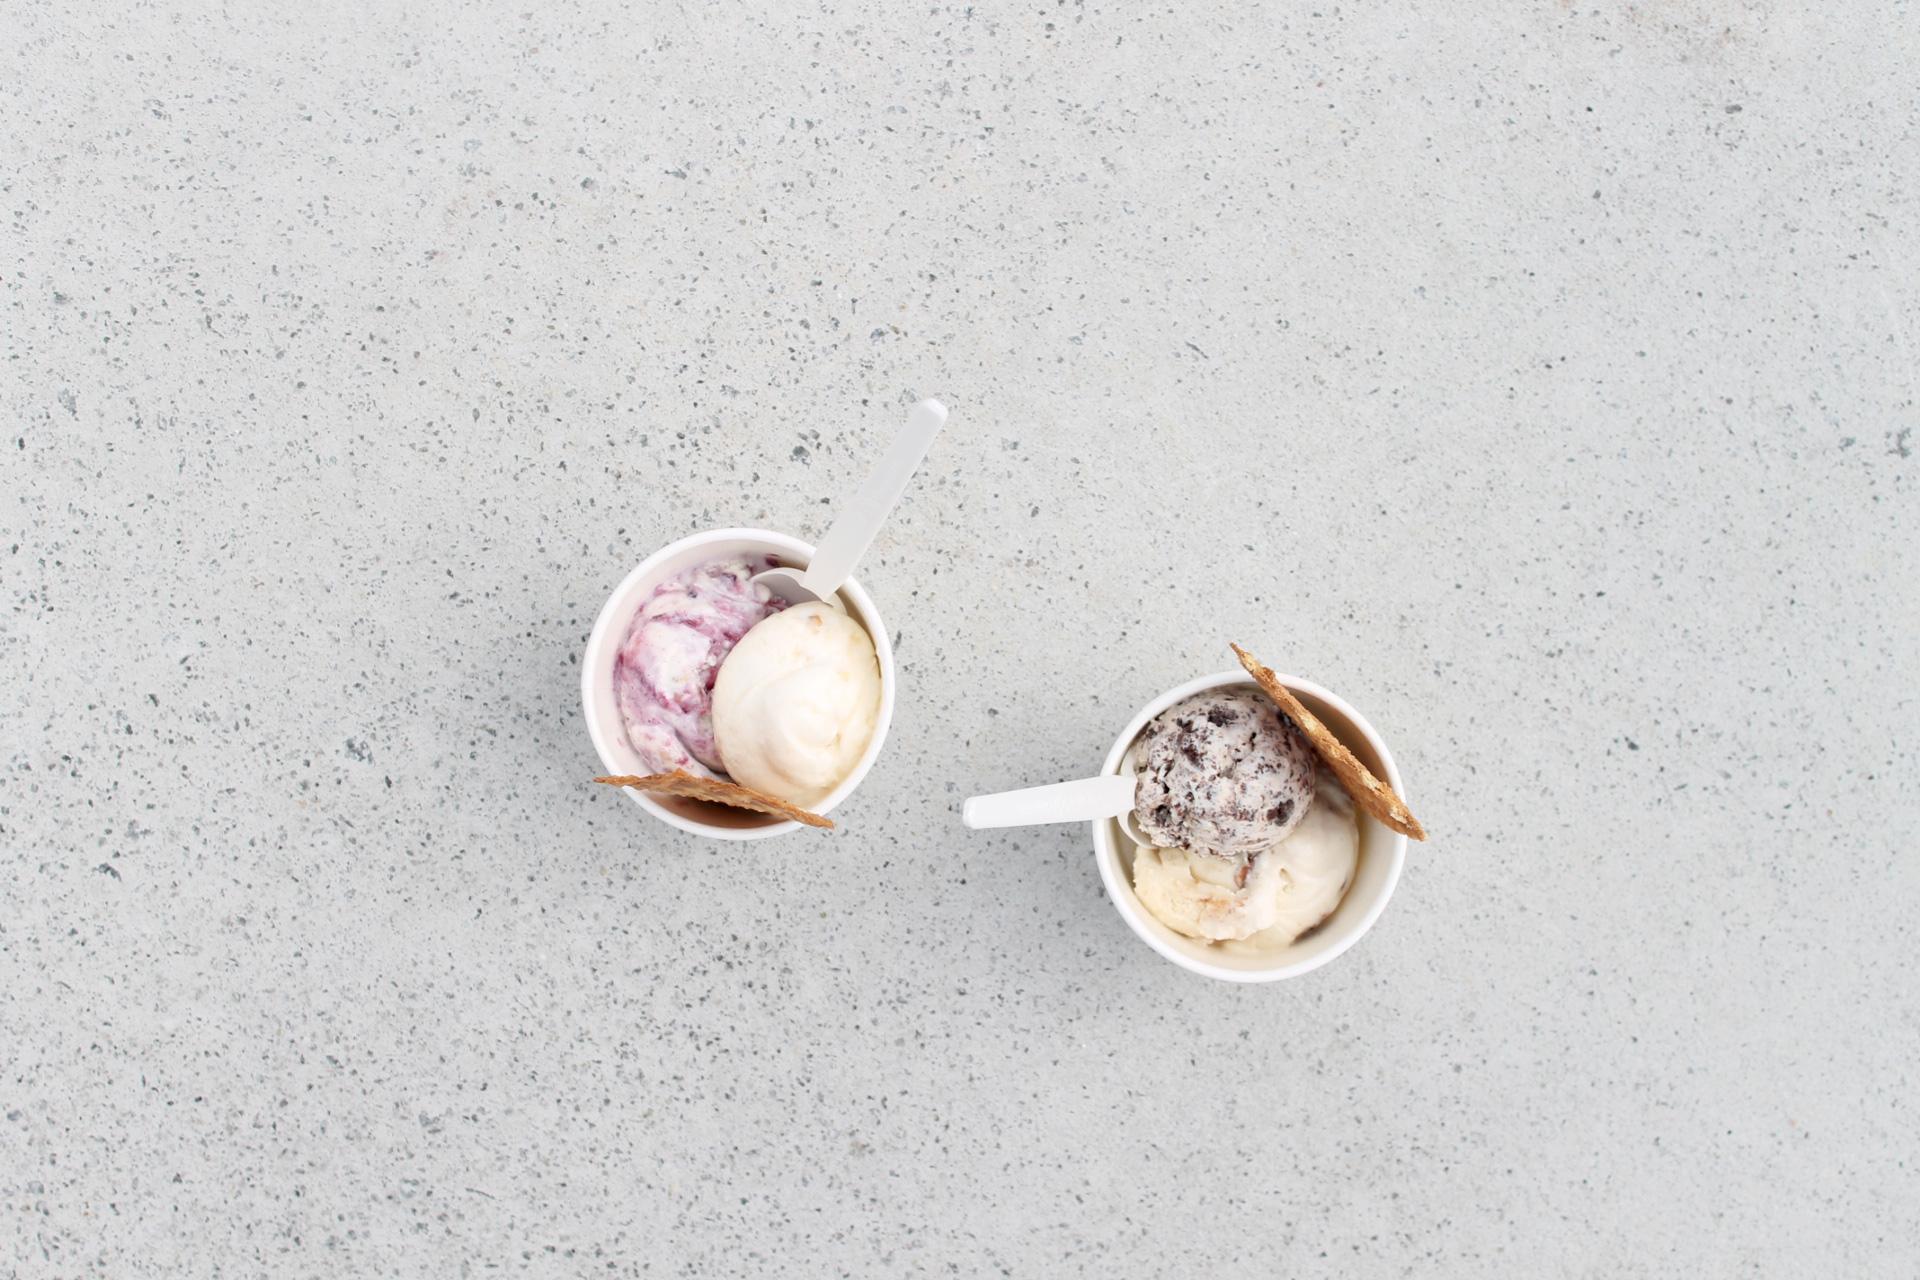 Krog Street Market Ice Cream